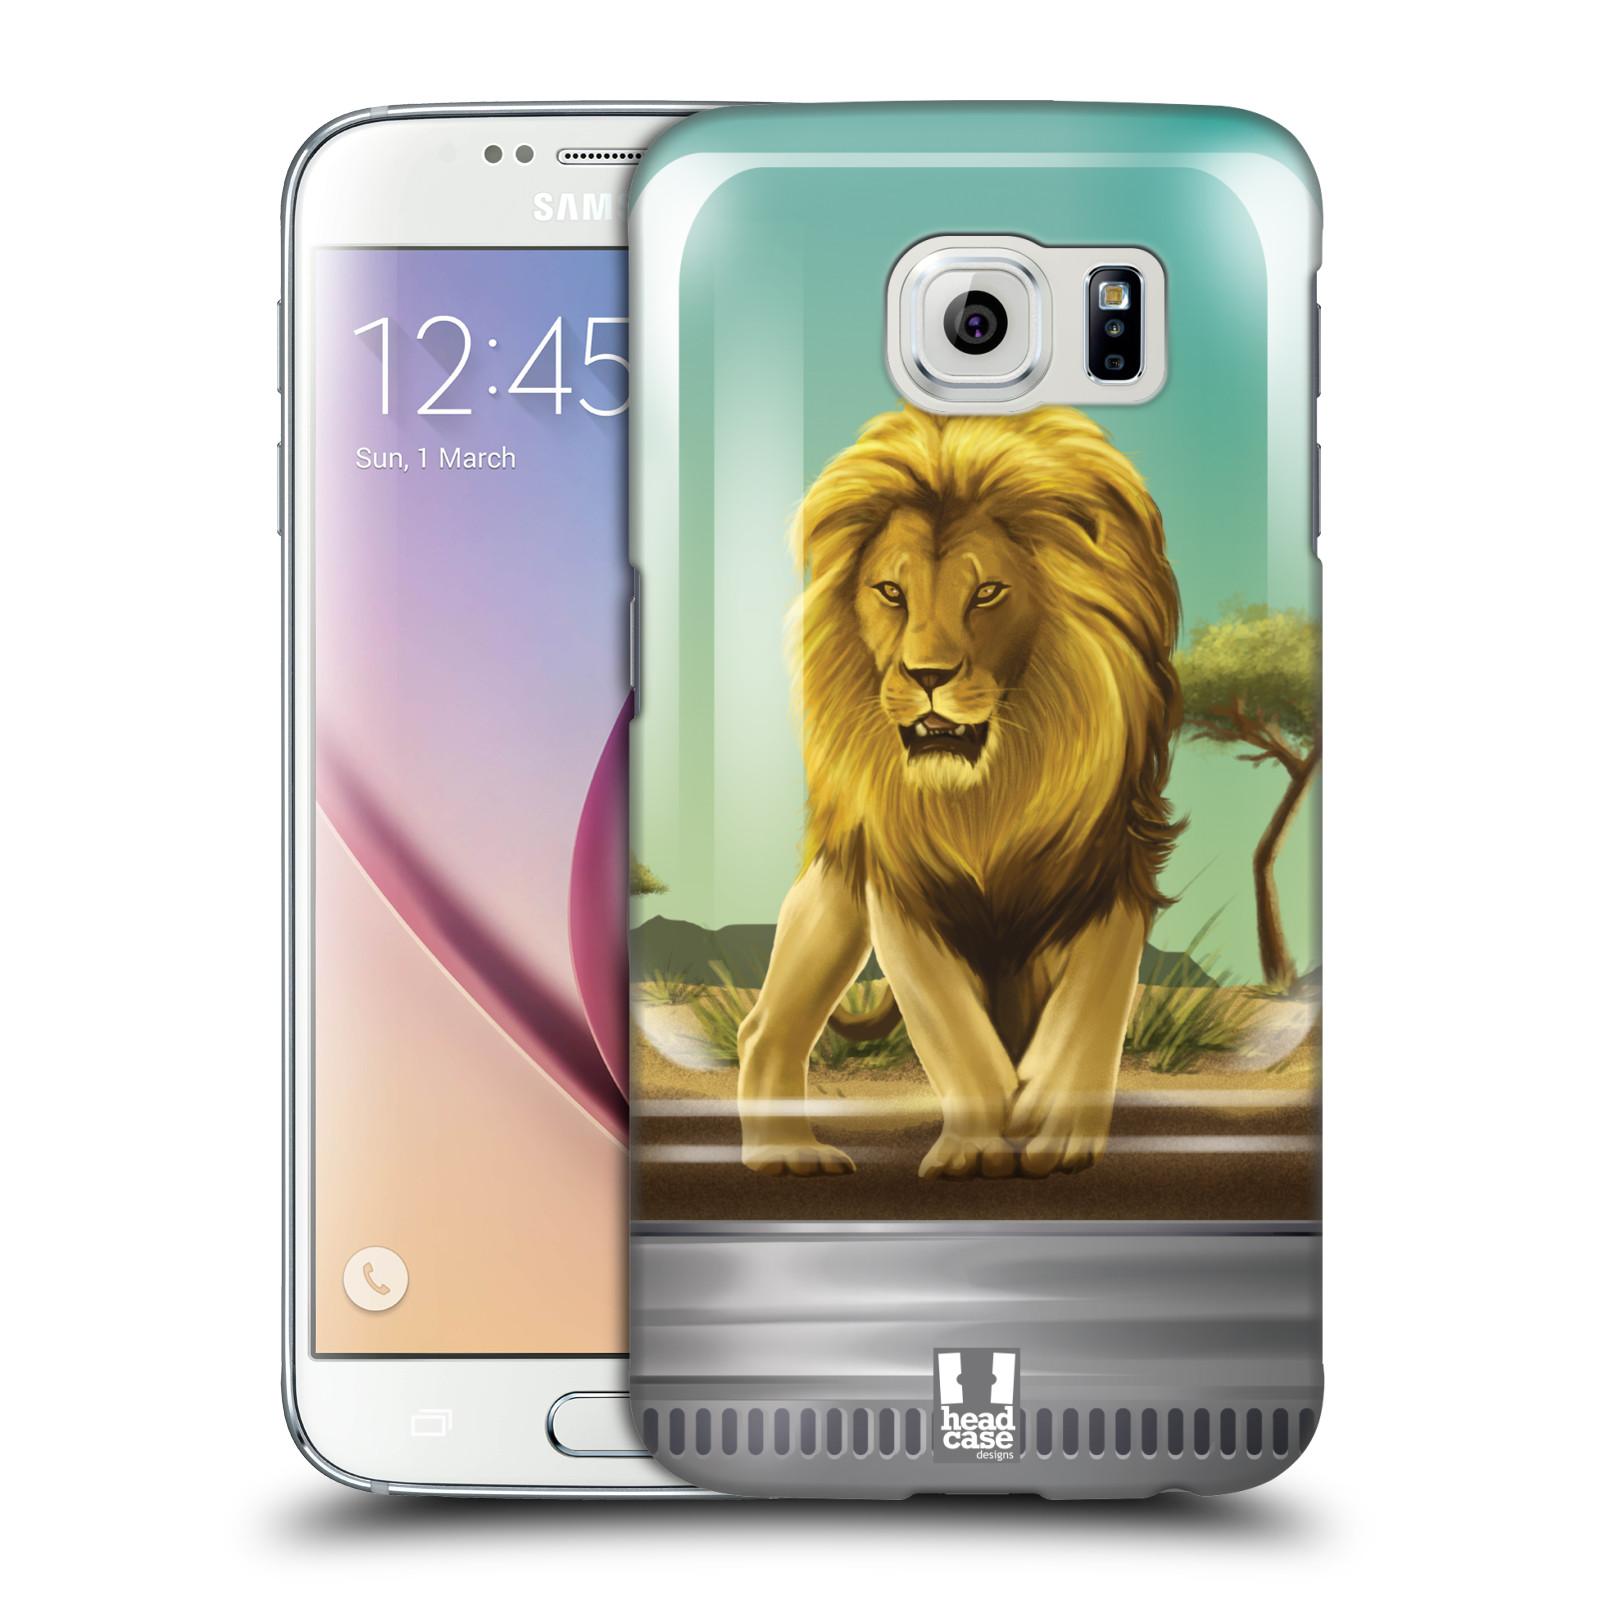 HEAD CASE plastový obal na mobil SAMSUNG Galaxy S6 (G9200, G920F) vzor Zvířátka v těžítku lev